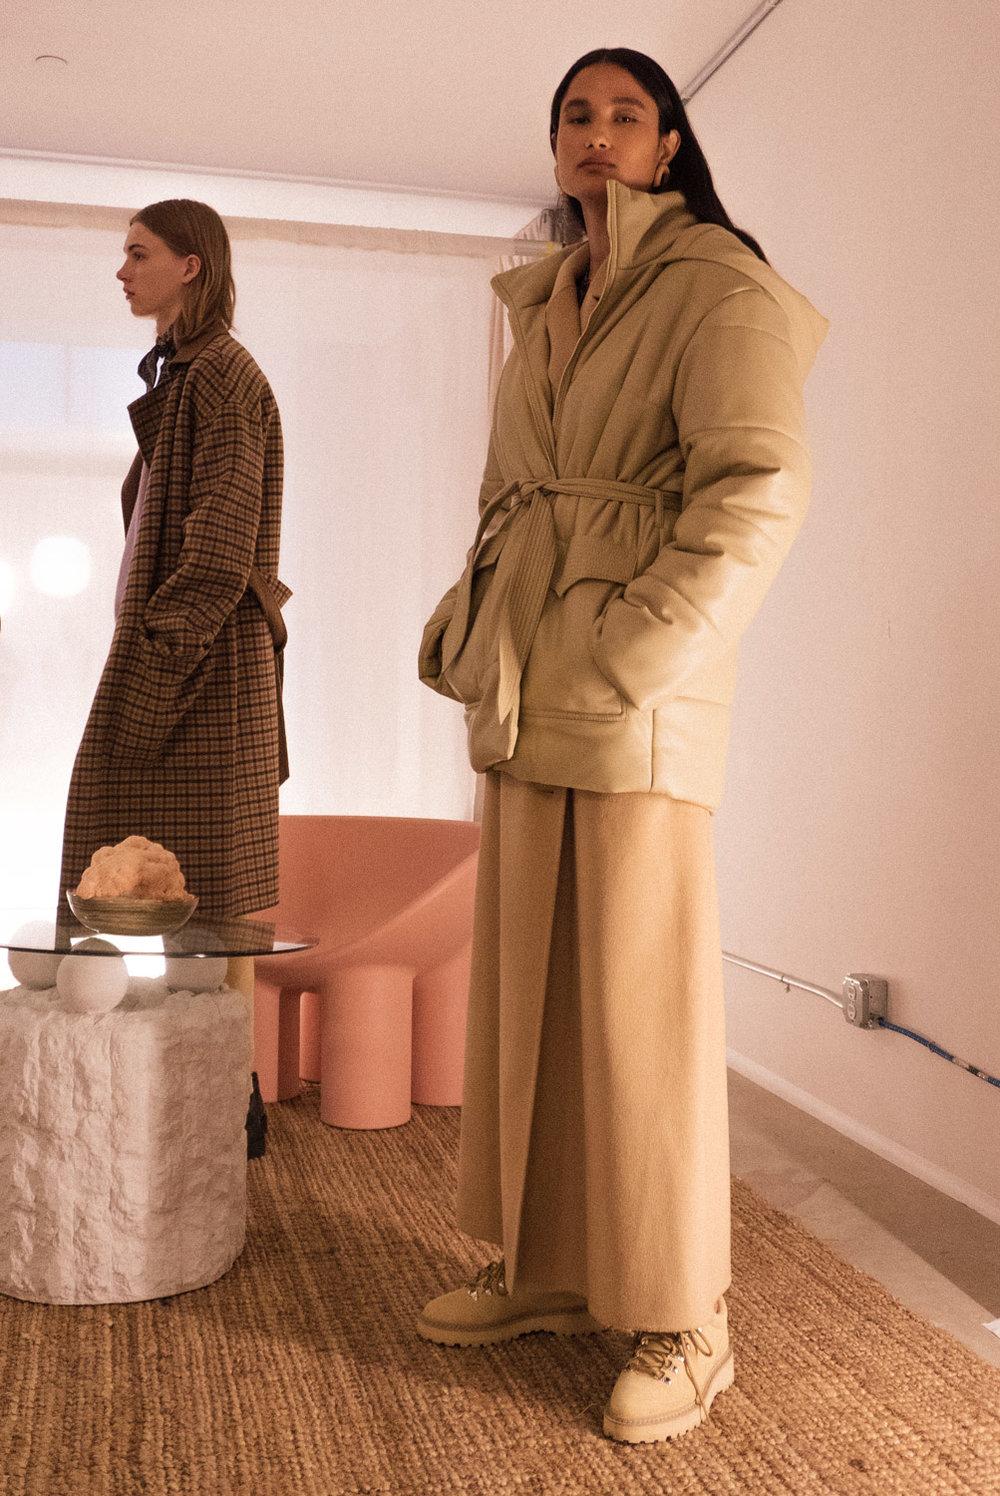 Lenox Hooded Puffer Coat  | €790  Rupi Asymmetrical Frayed-Hem Skirt  | €420  Joan Leather Lace Up Boots  | €370